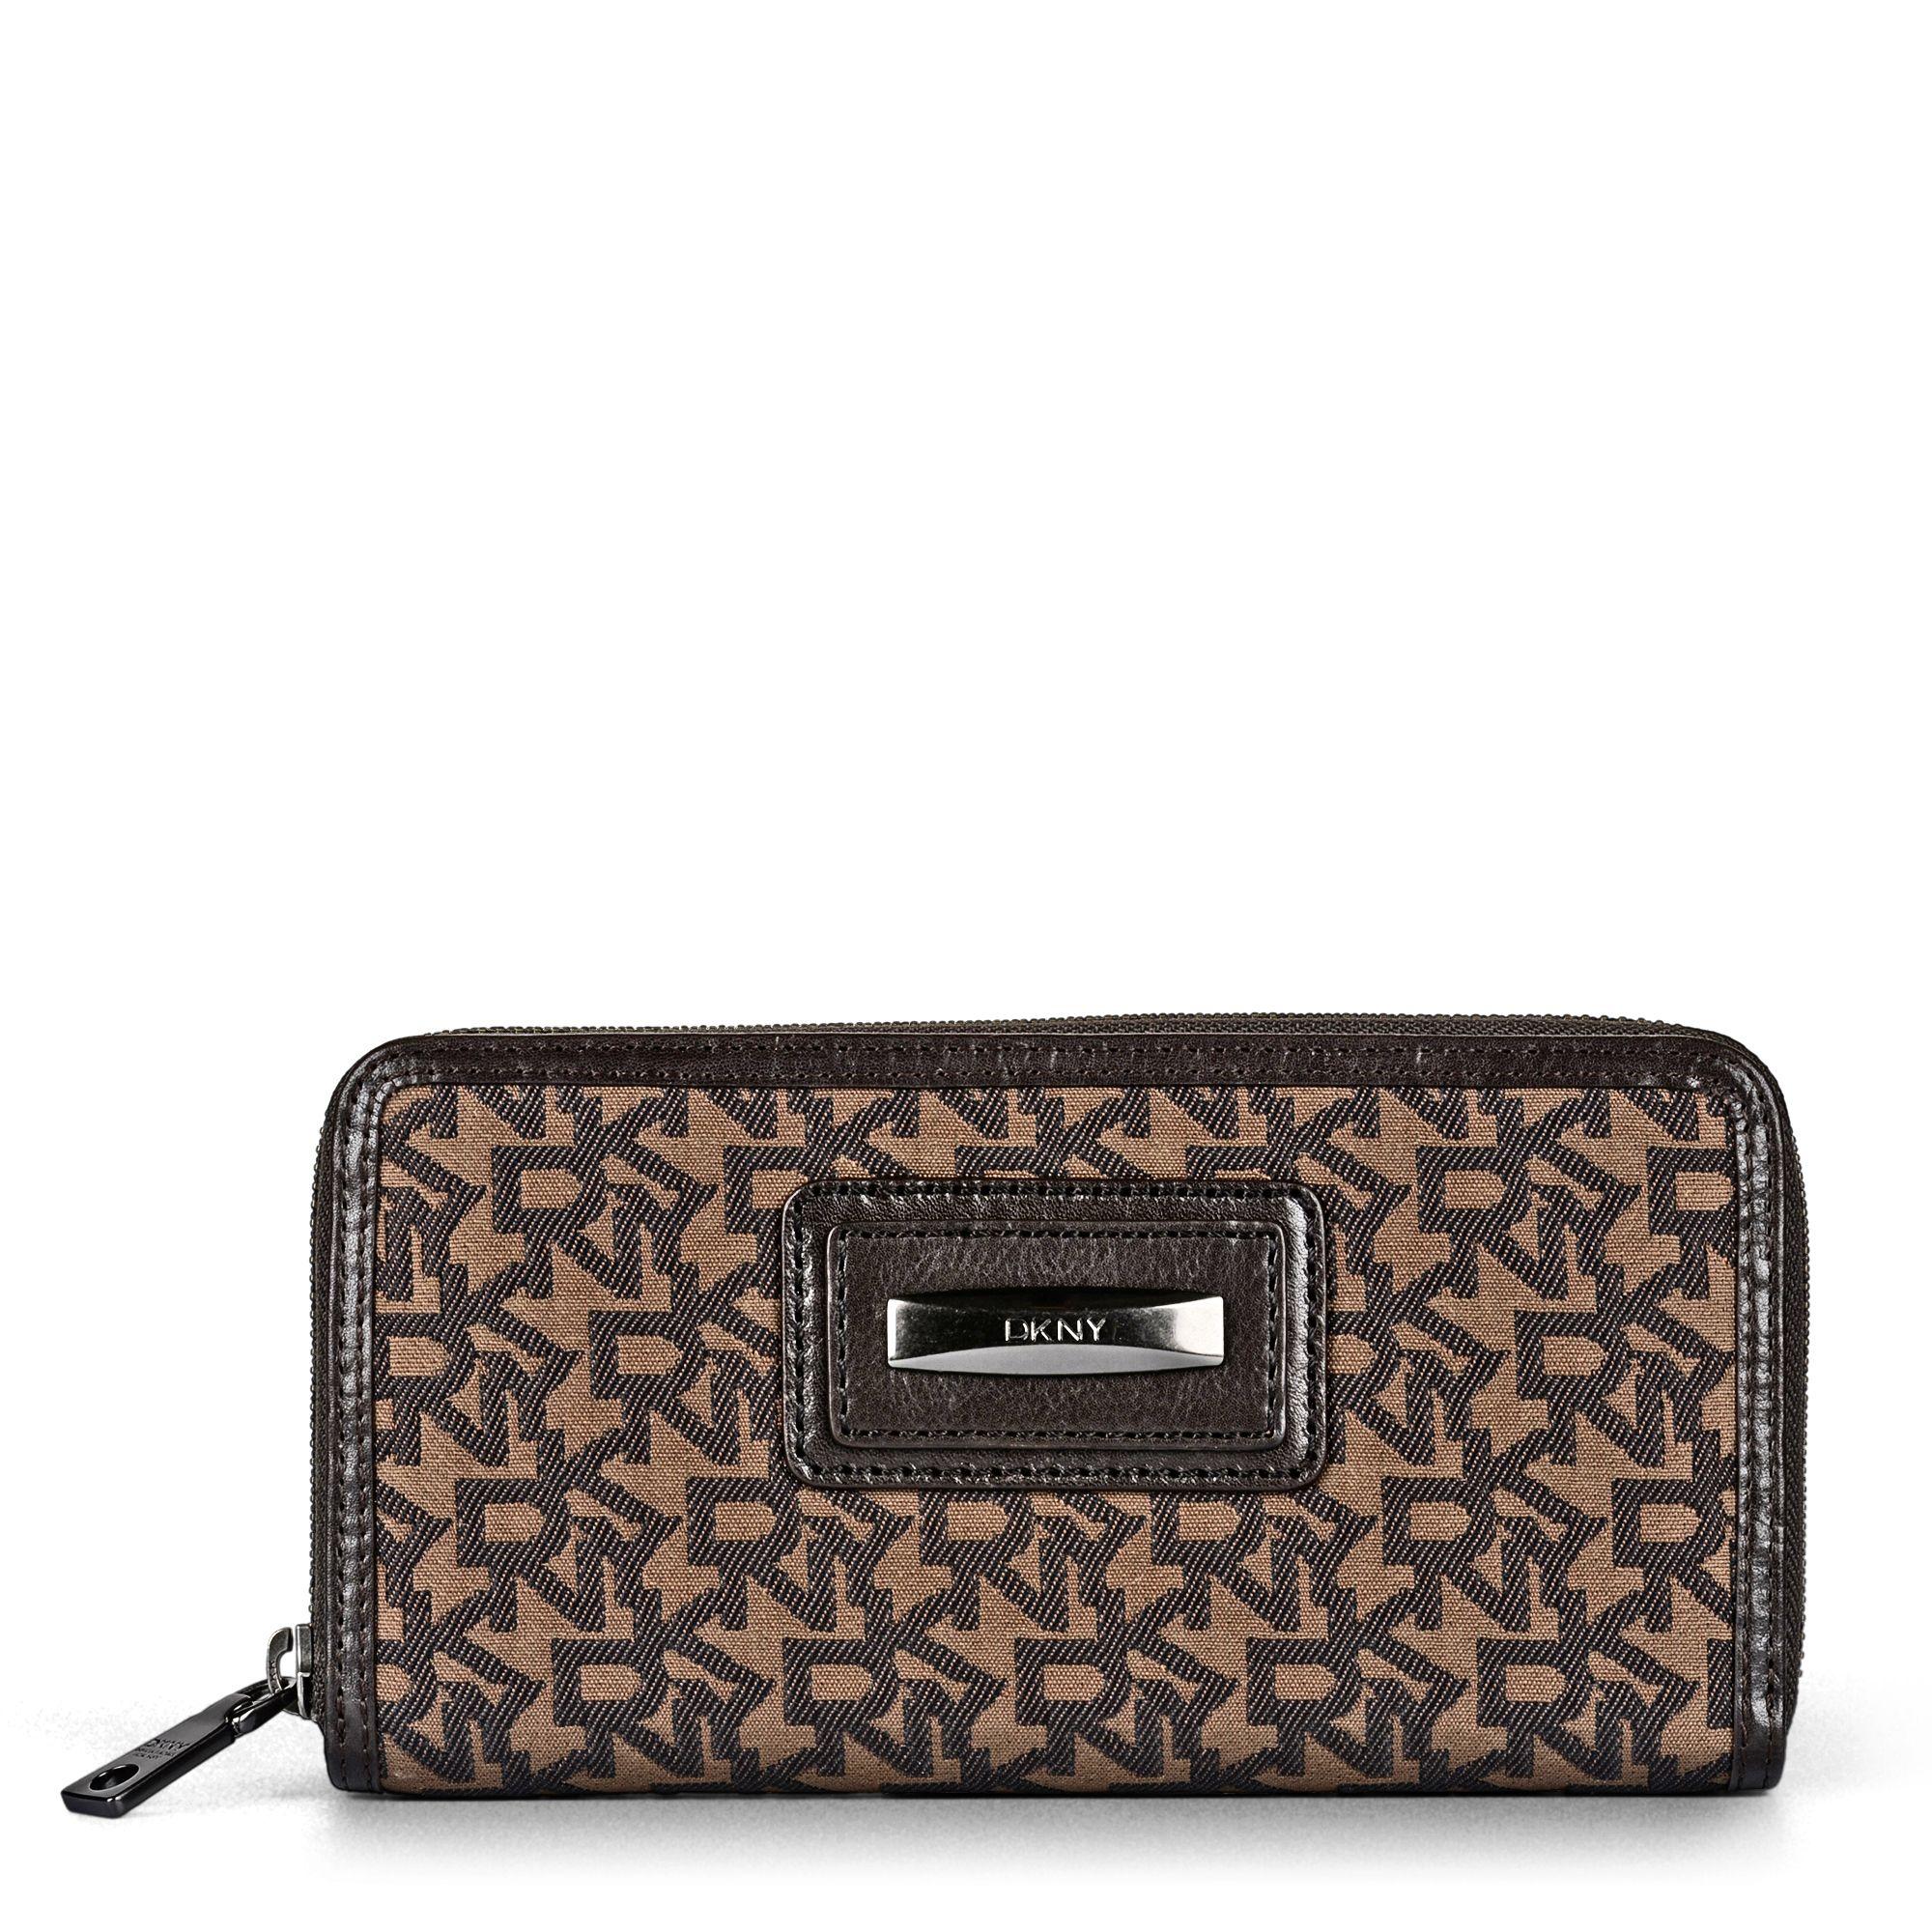 Dkny Bryant Park Zip-Around Wallet in Orange | Lyst |Dkny Wallet